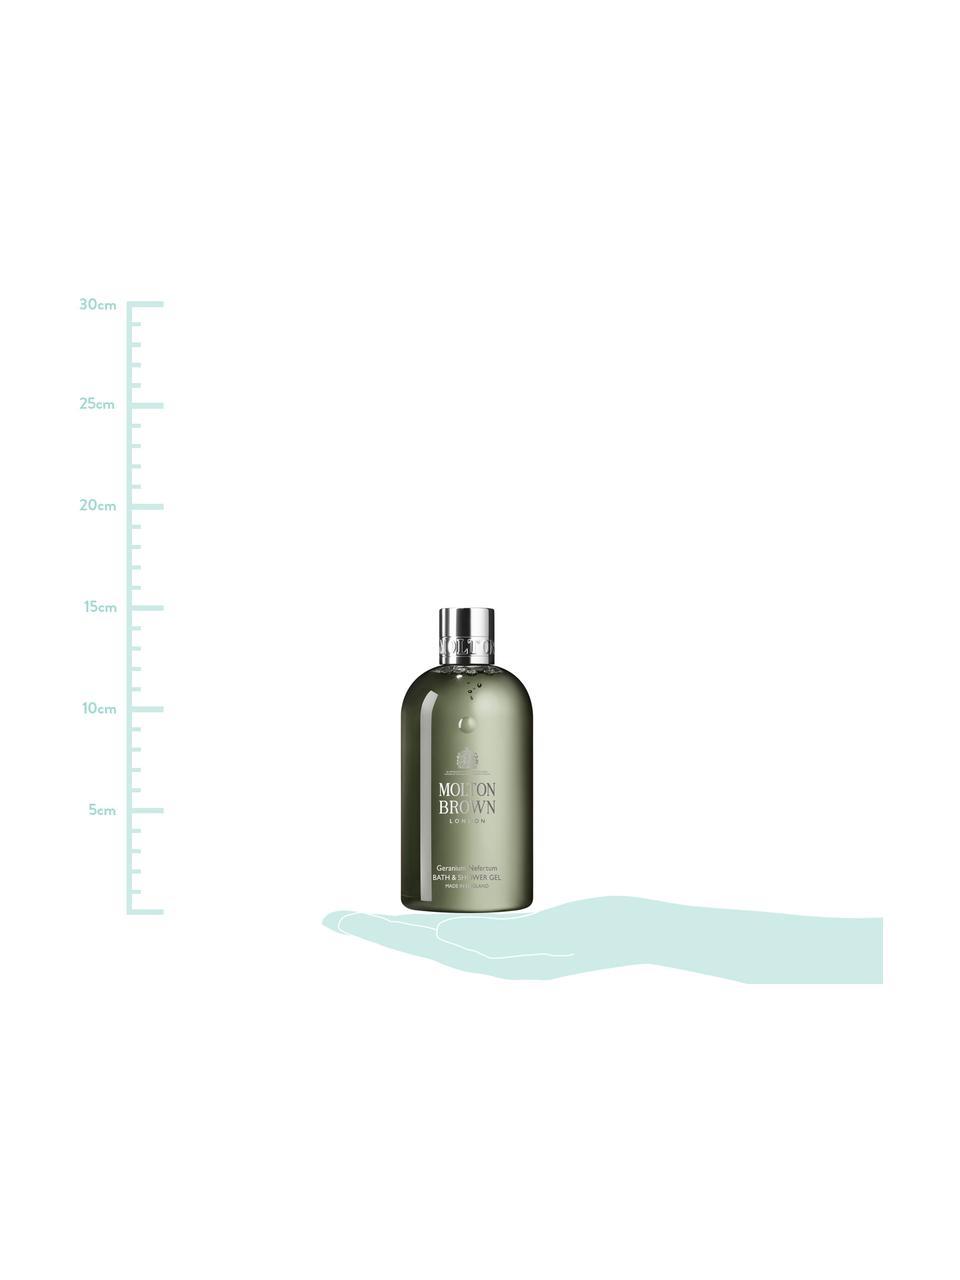 Duschgel Molton (Geranium), Behälter: Recycelbarer Kunststoff, Grün, 6 x 15 cm